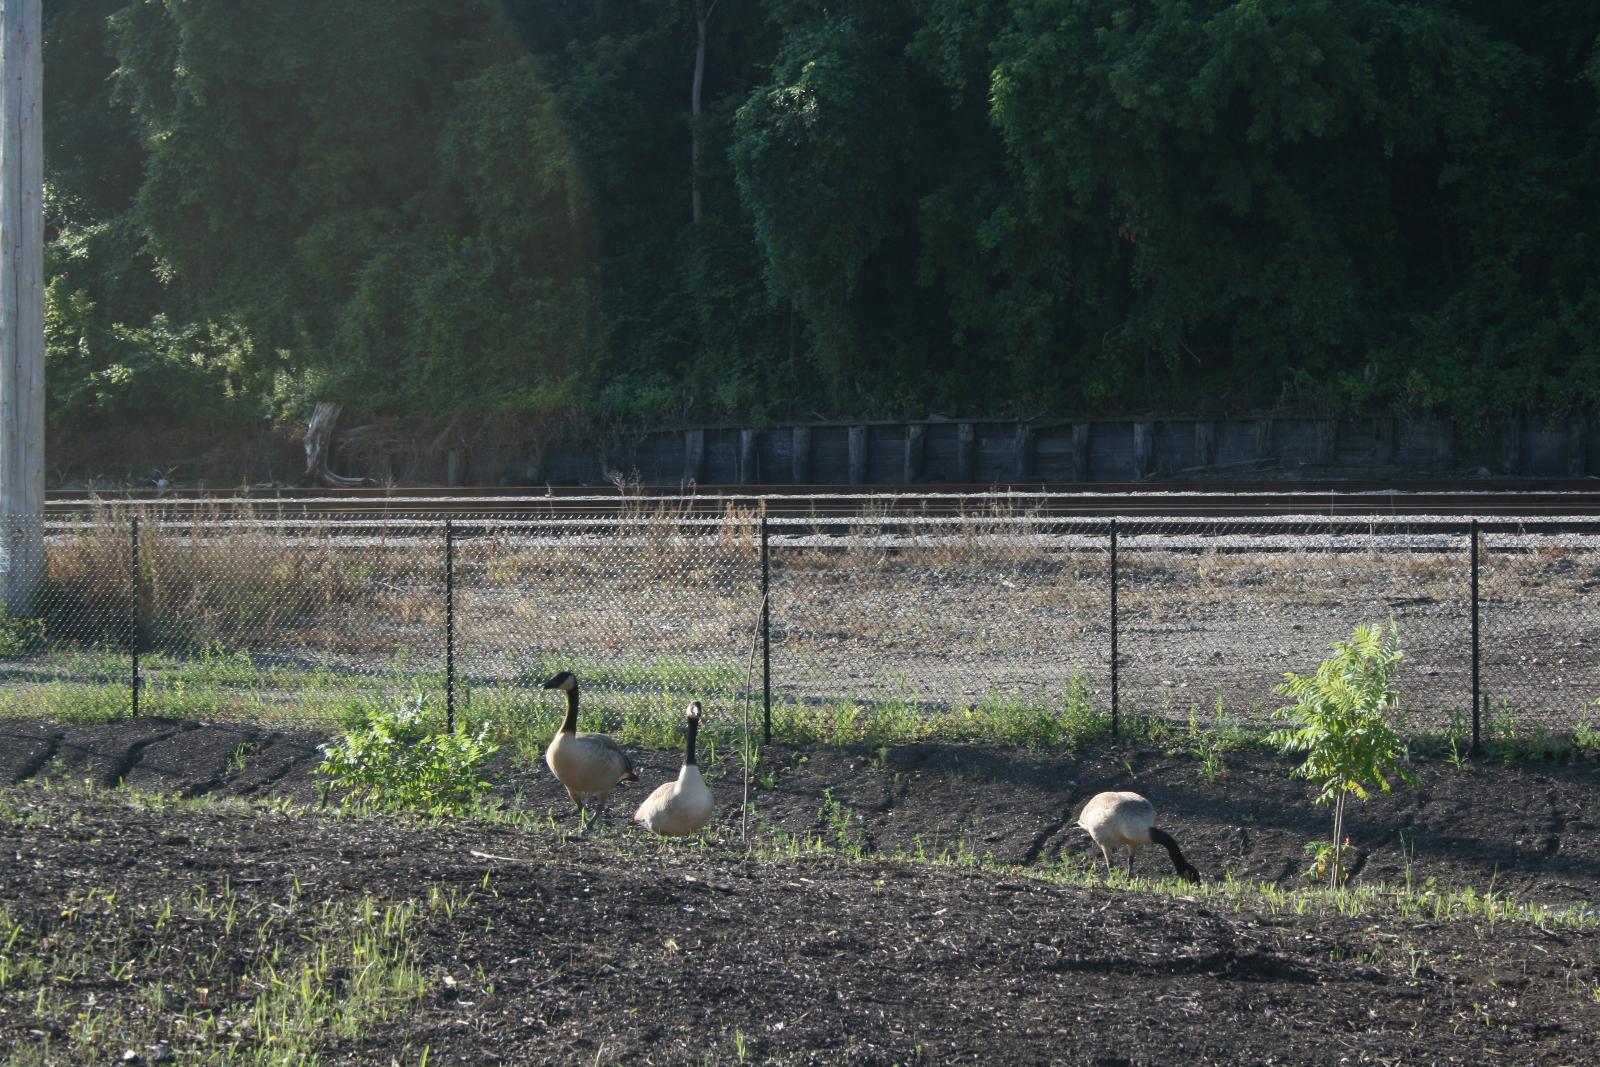 Geese enjoying the new park.